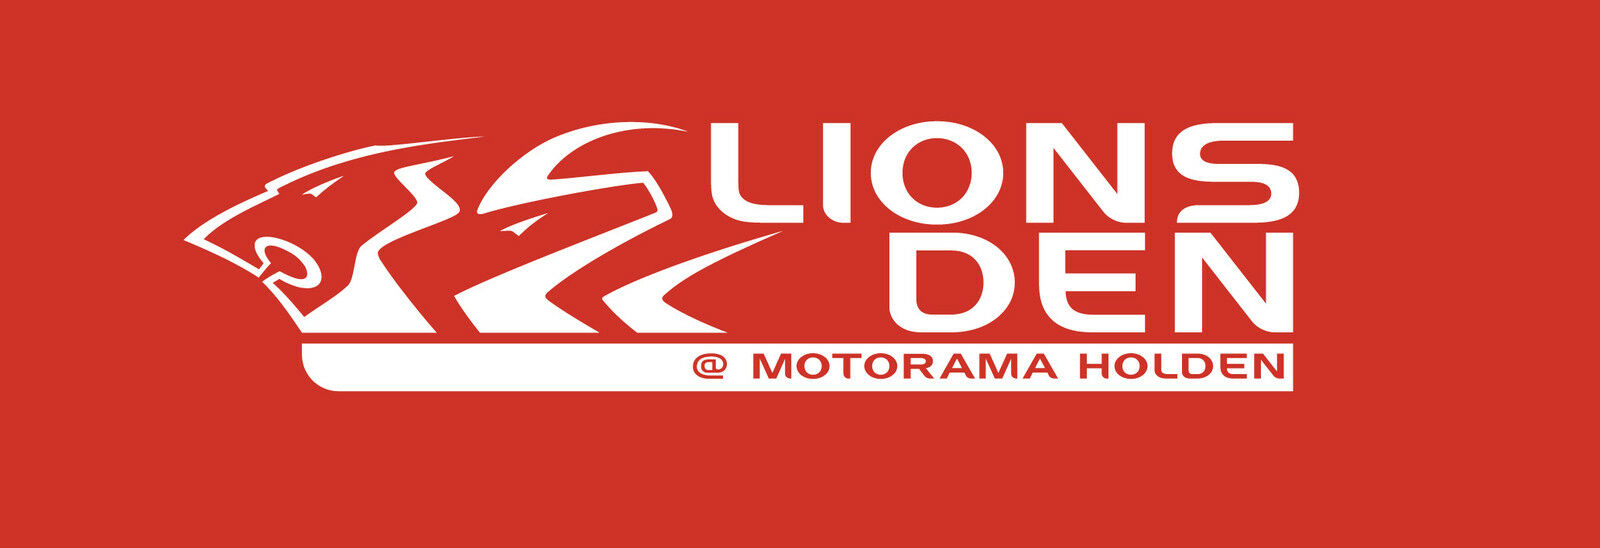 motorama_online